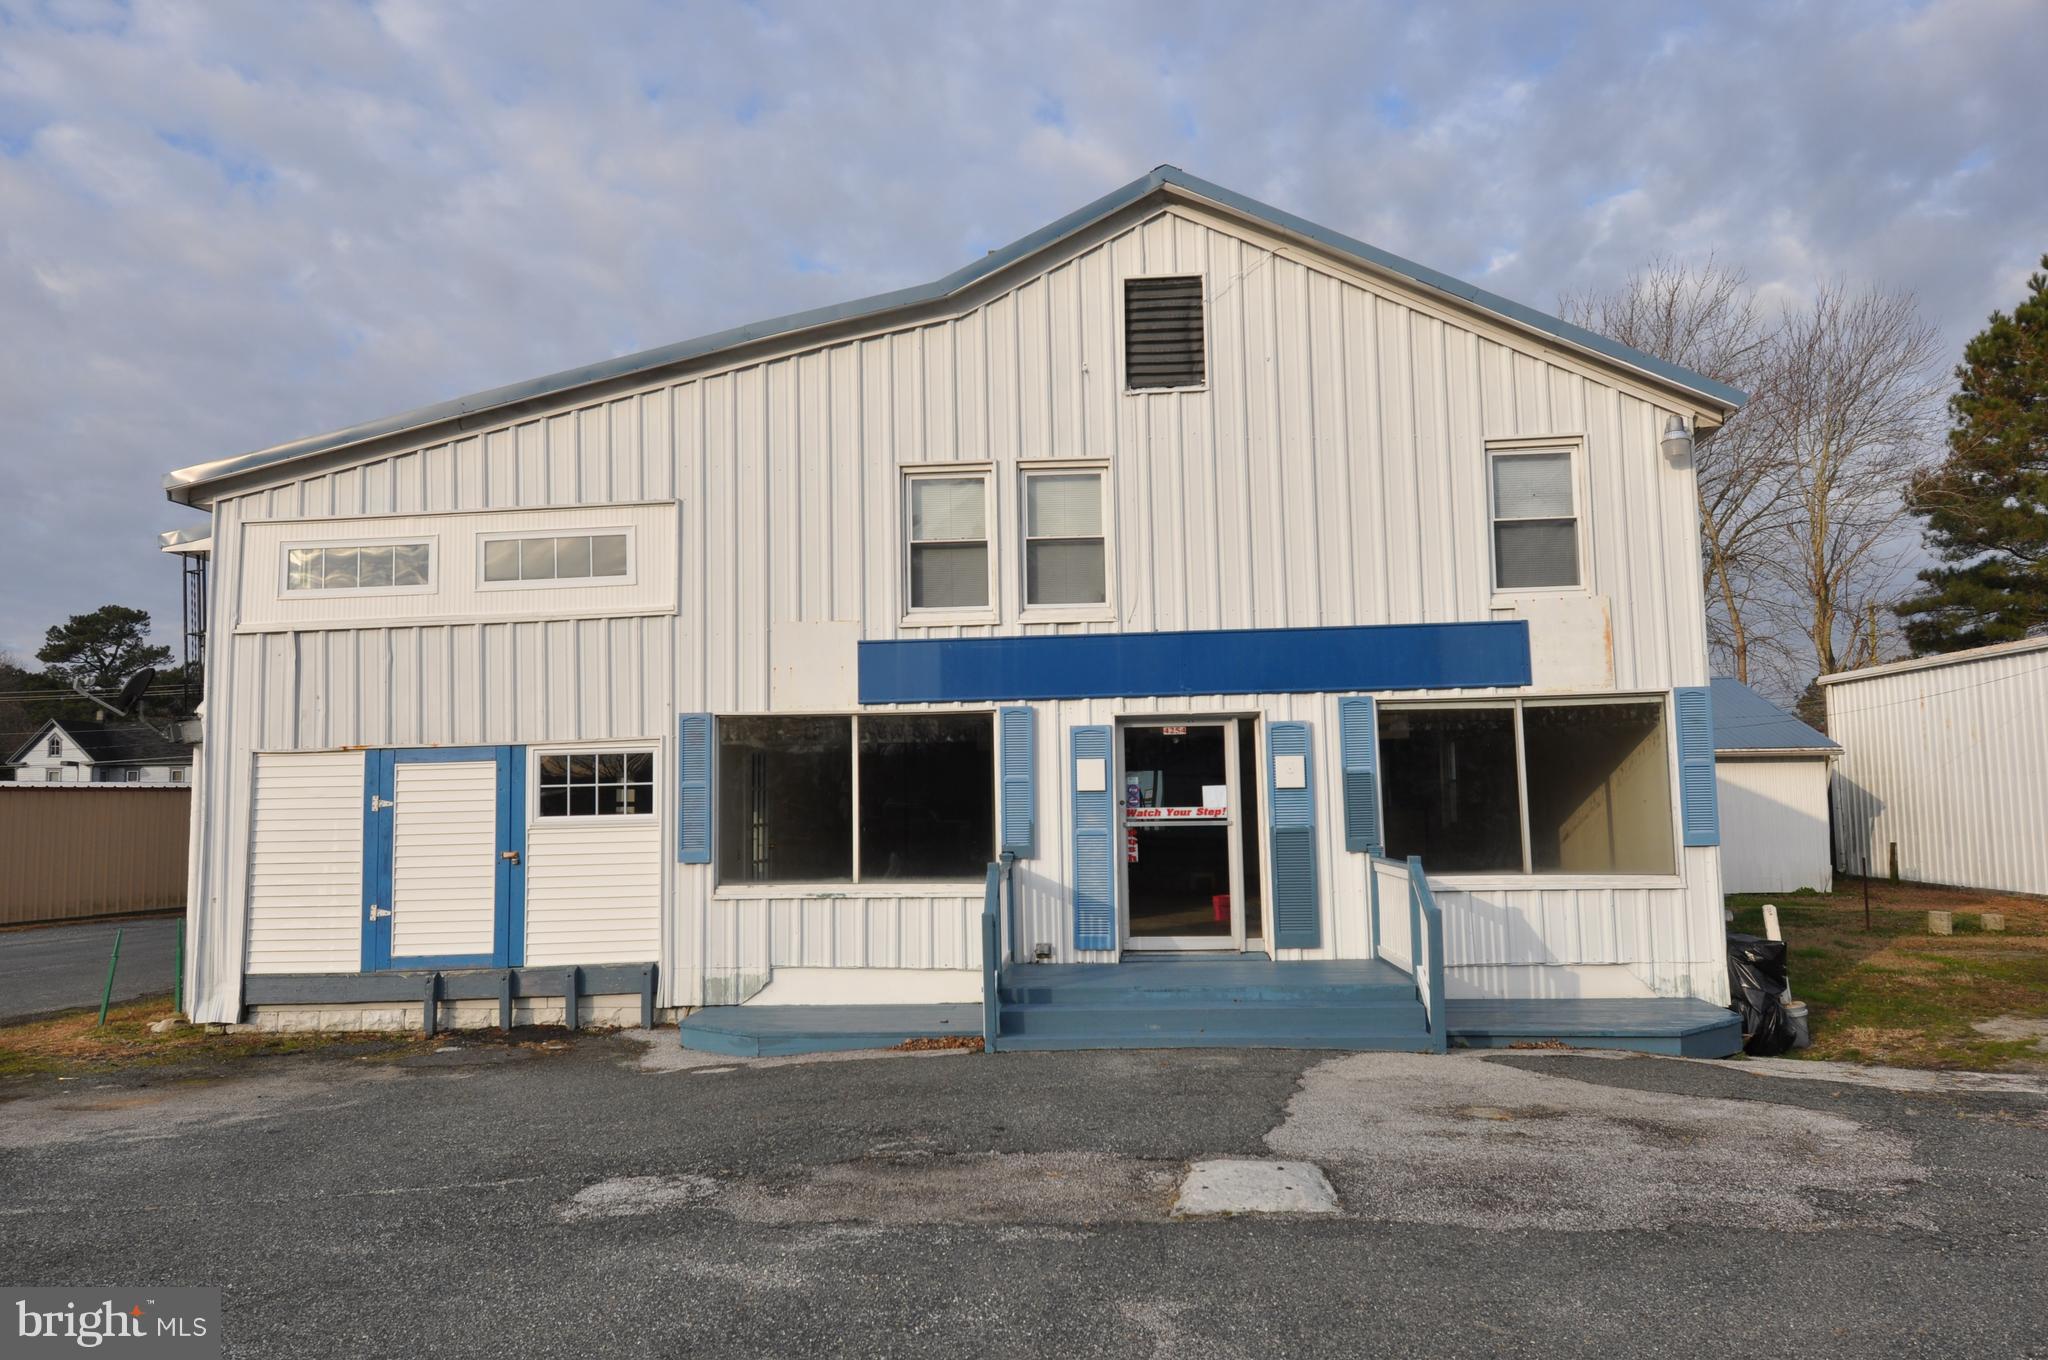 4254 LANKFORD HWY, NEW CHURCH, VA 23415